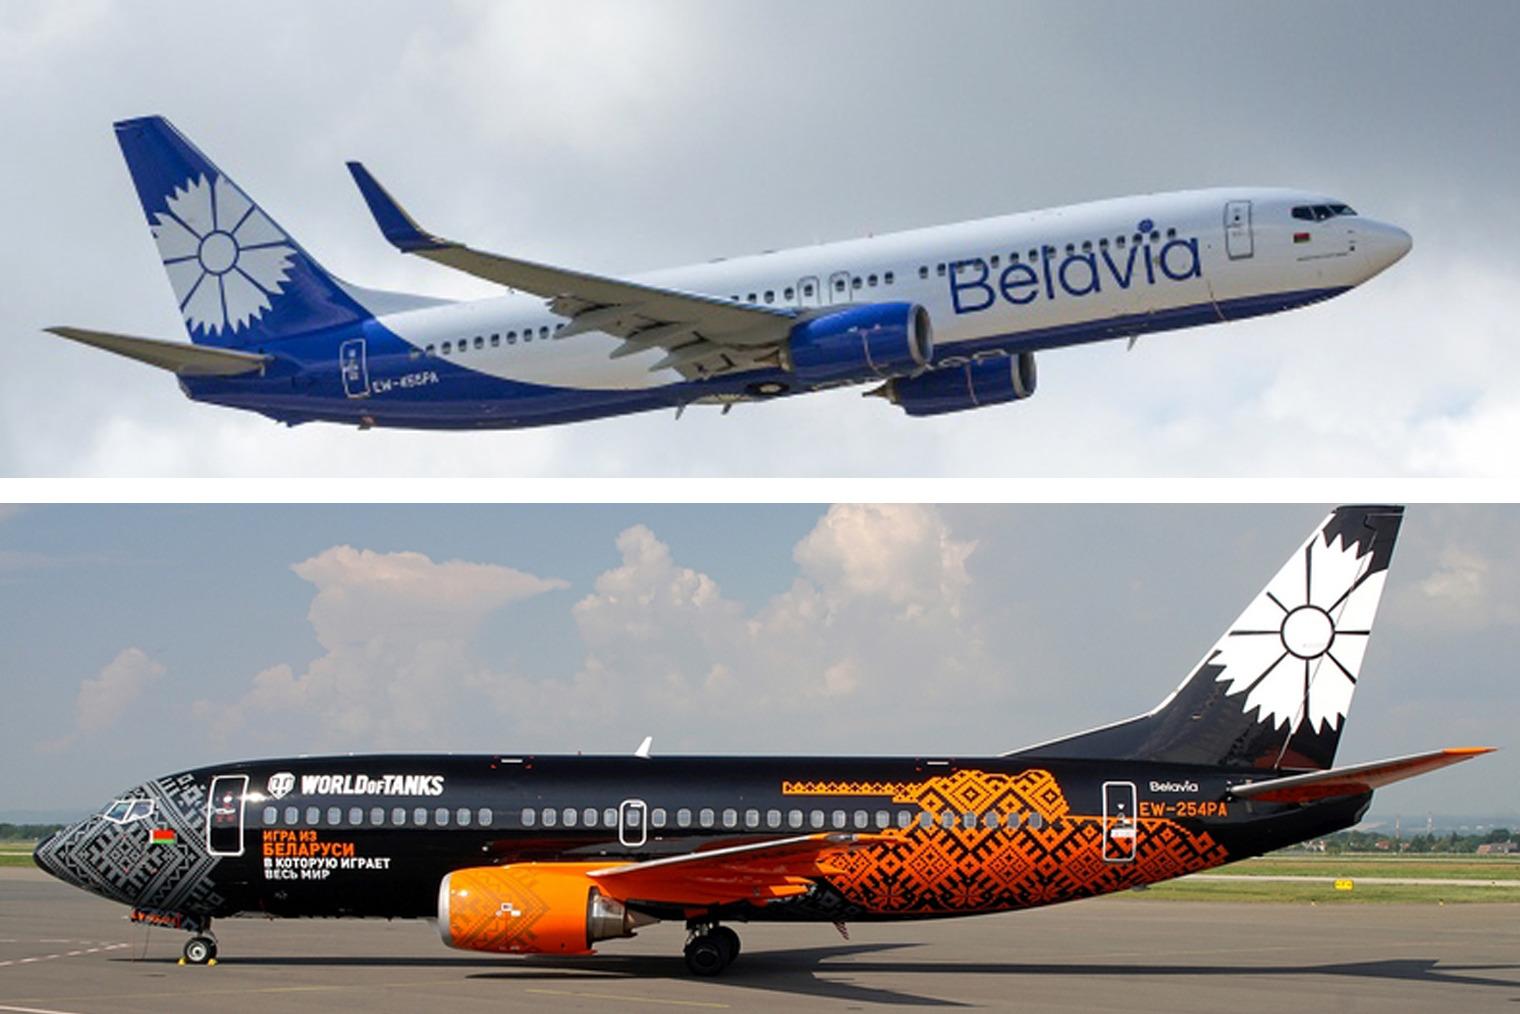 Новые самолёты «Белавиа», фото: Onliner.by, Planespotters.net